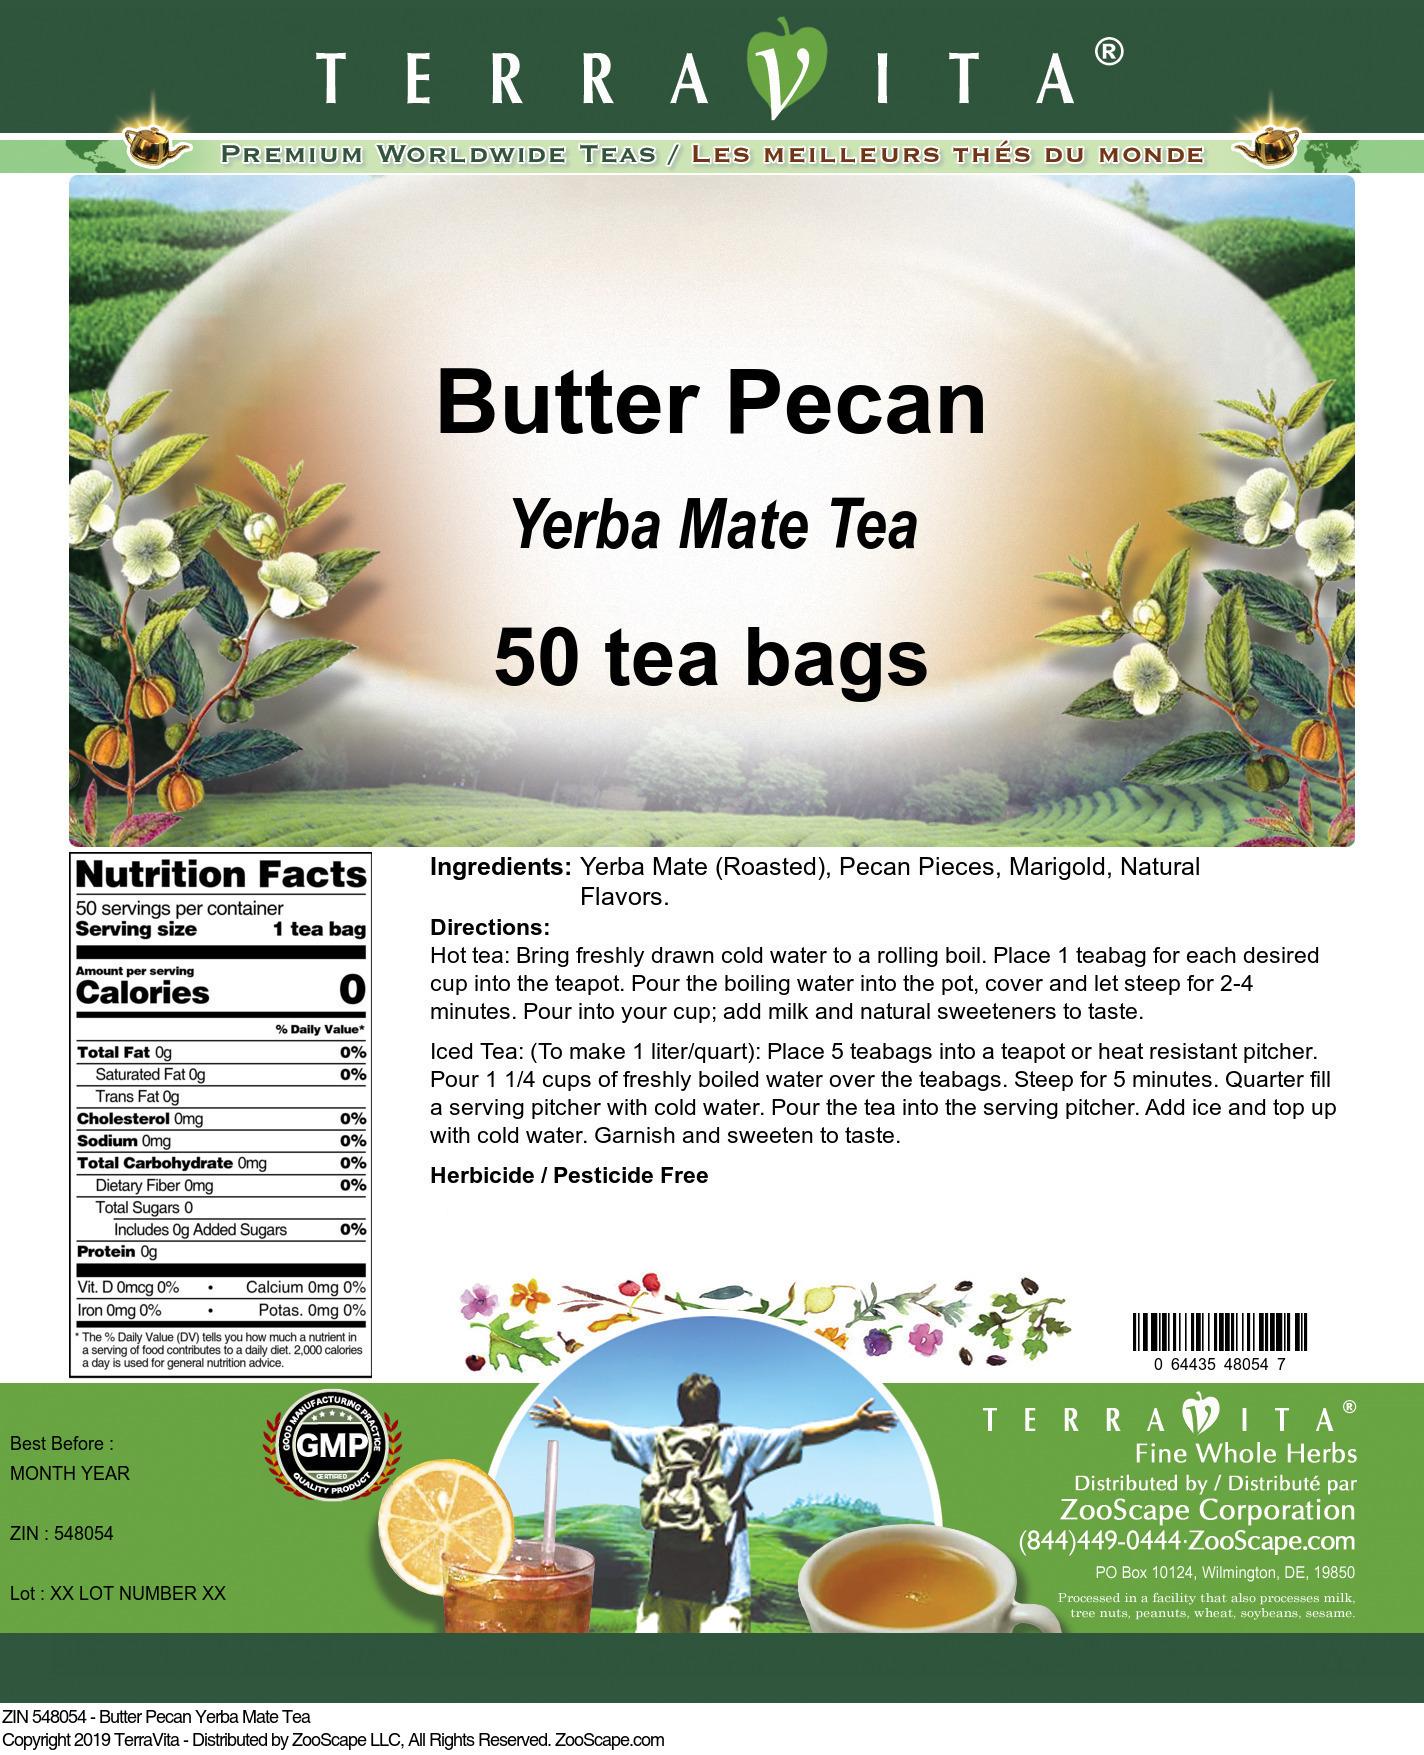 Butter Pecan Yerba Mate Tea